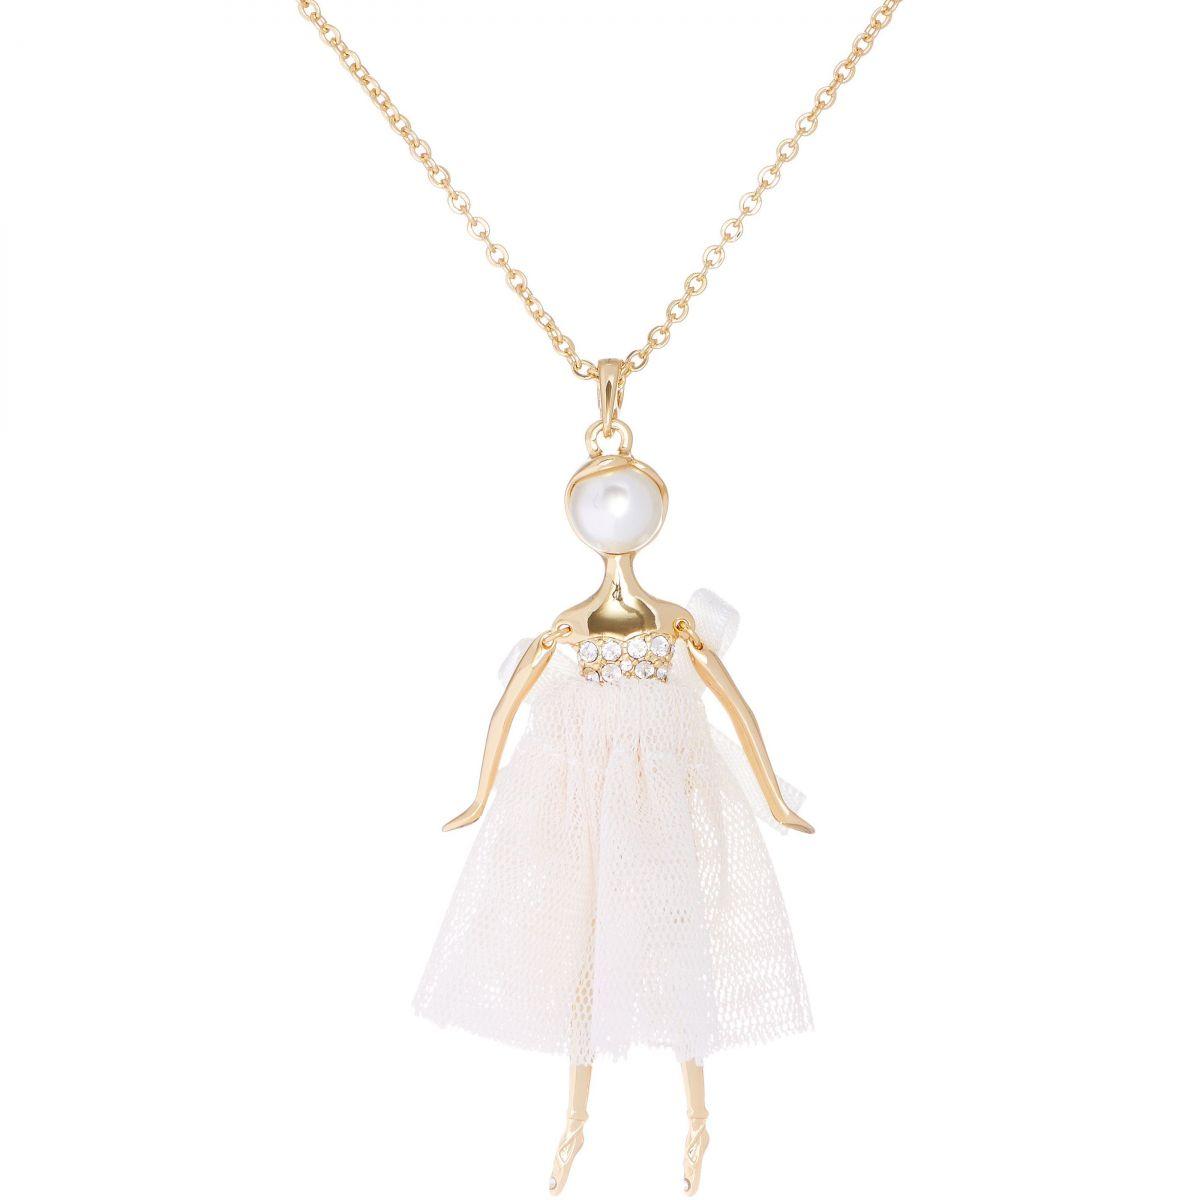 Ted baker jewellery bijou pave ballerina pendant joyera para ted baker jewellery bijou pave ballerina pendant joyera para mujer tbj1324 02 58 es watch shop aloadofball Choice Image